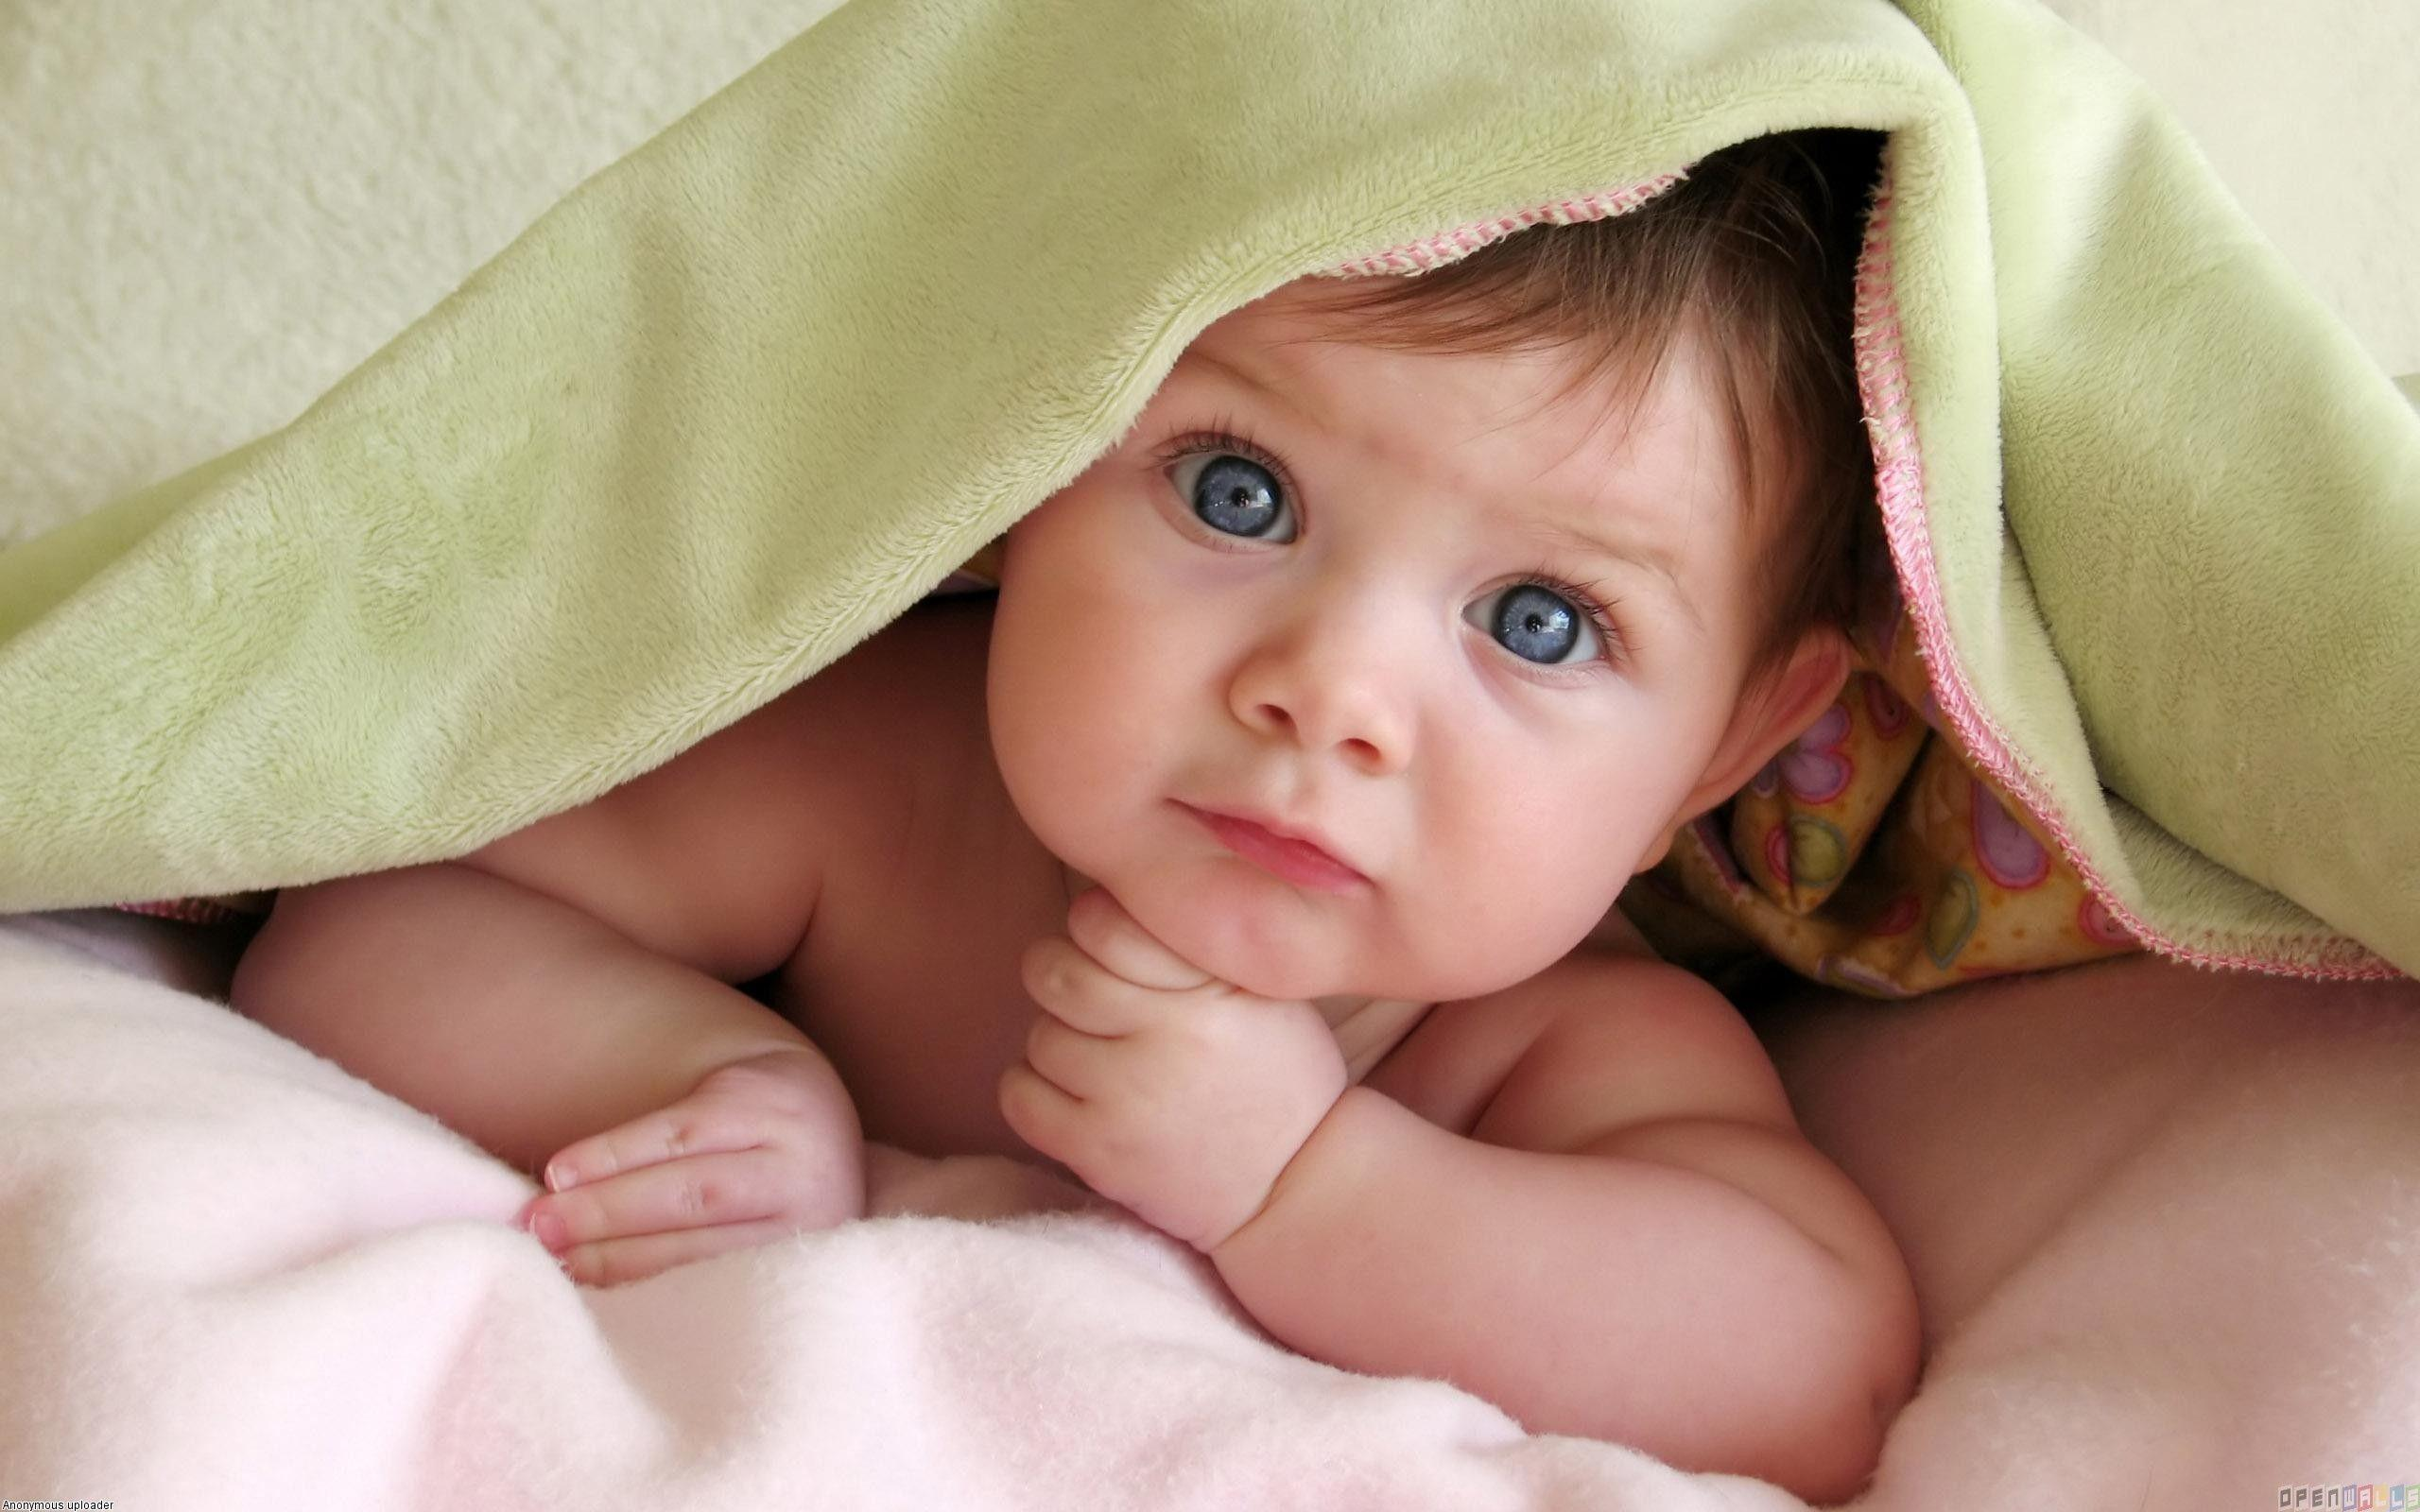 صور أطفال حلوين روعة خلفيات اطفال صور اطفال صغار For Android Apk Download